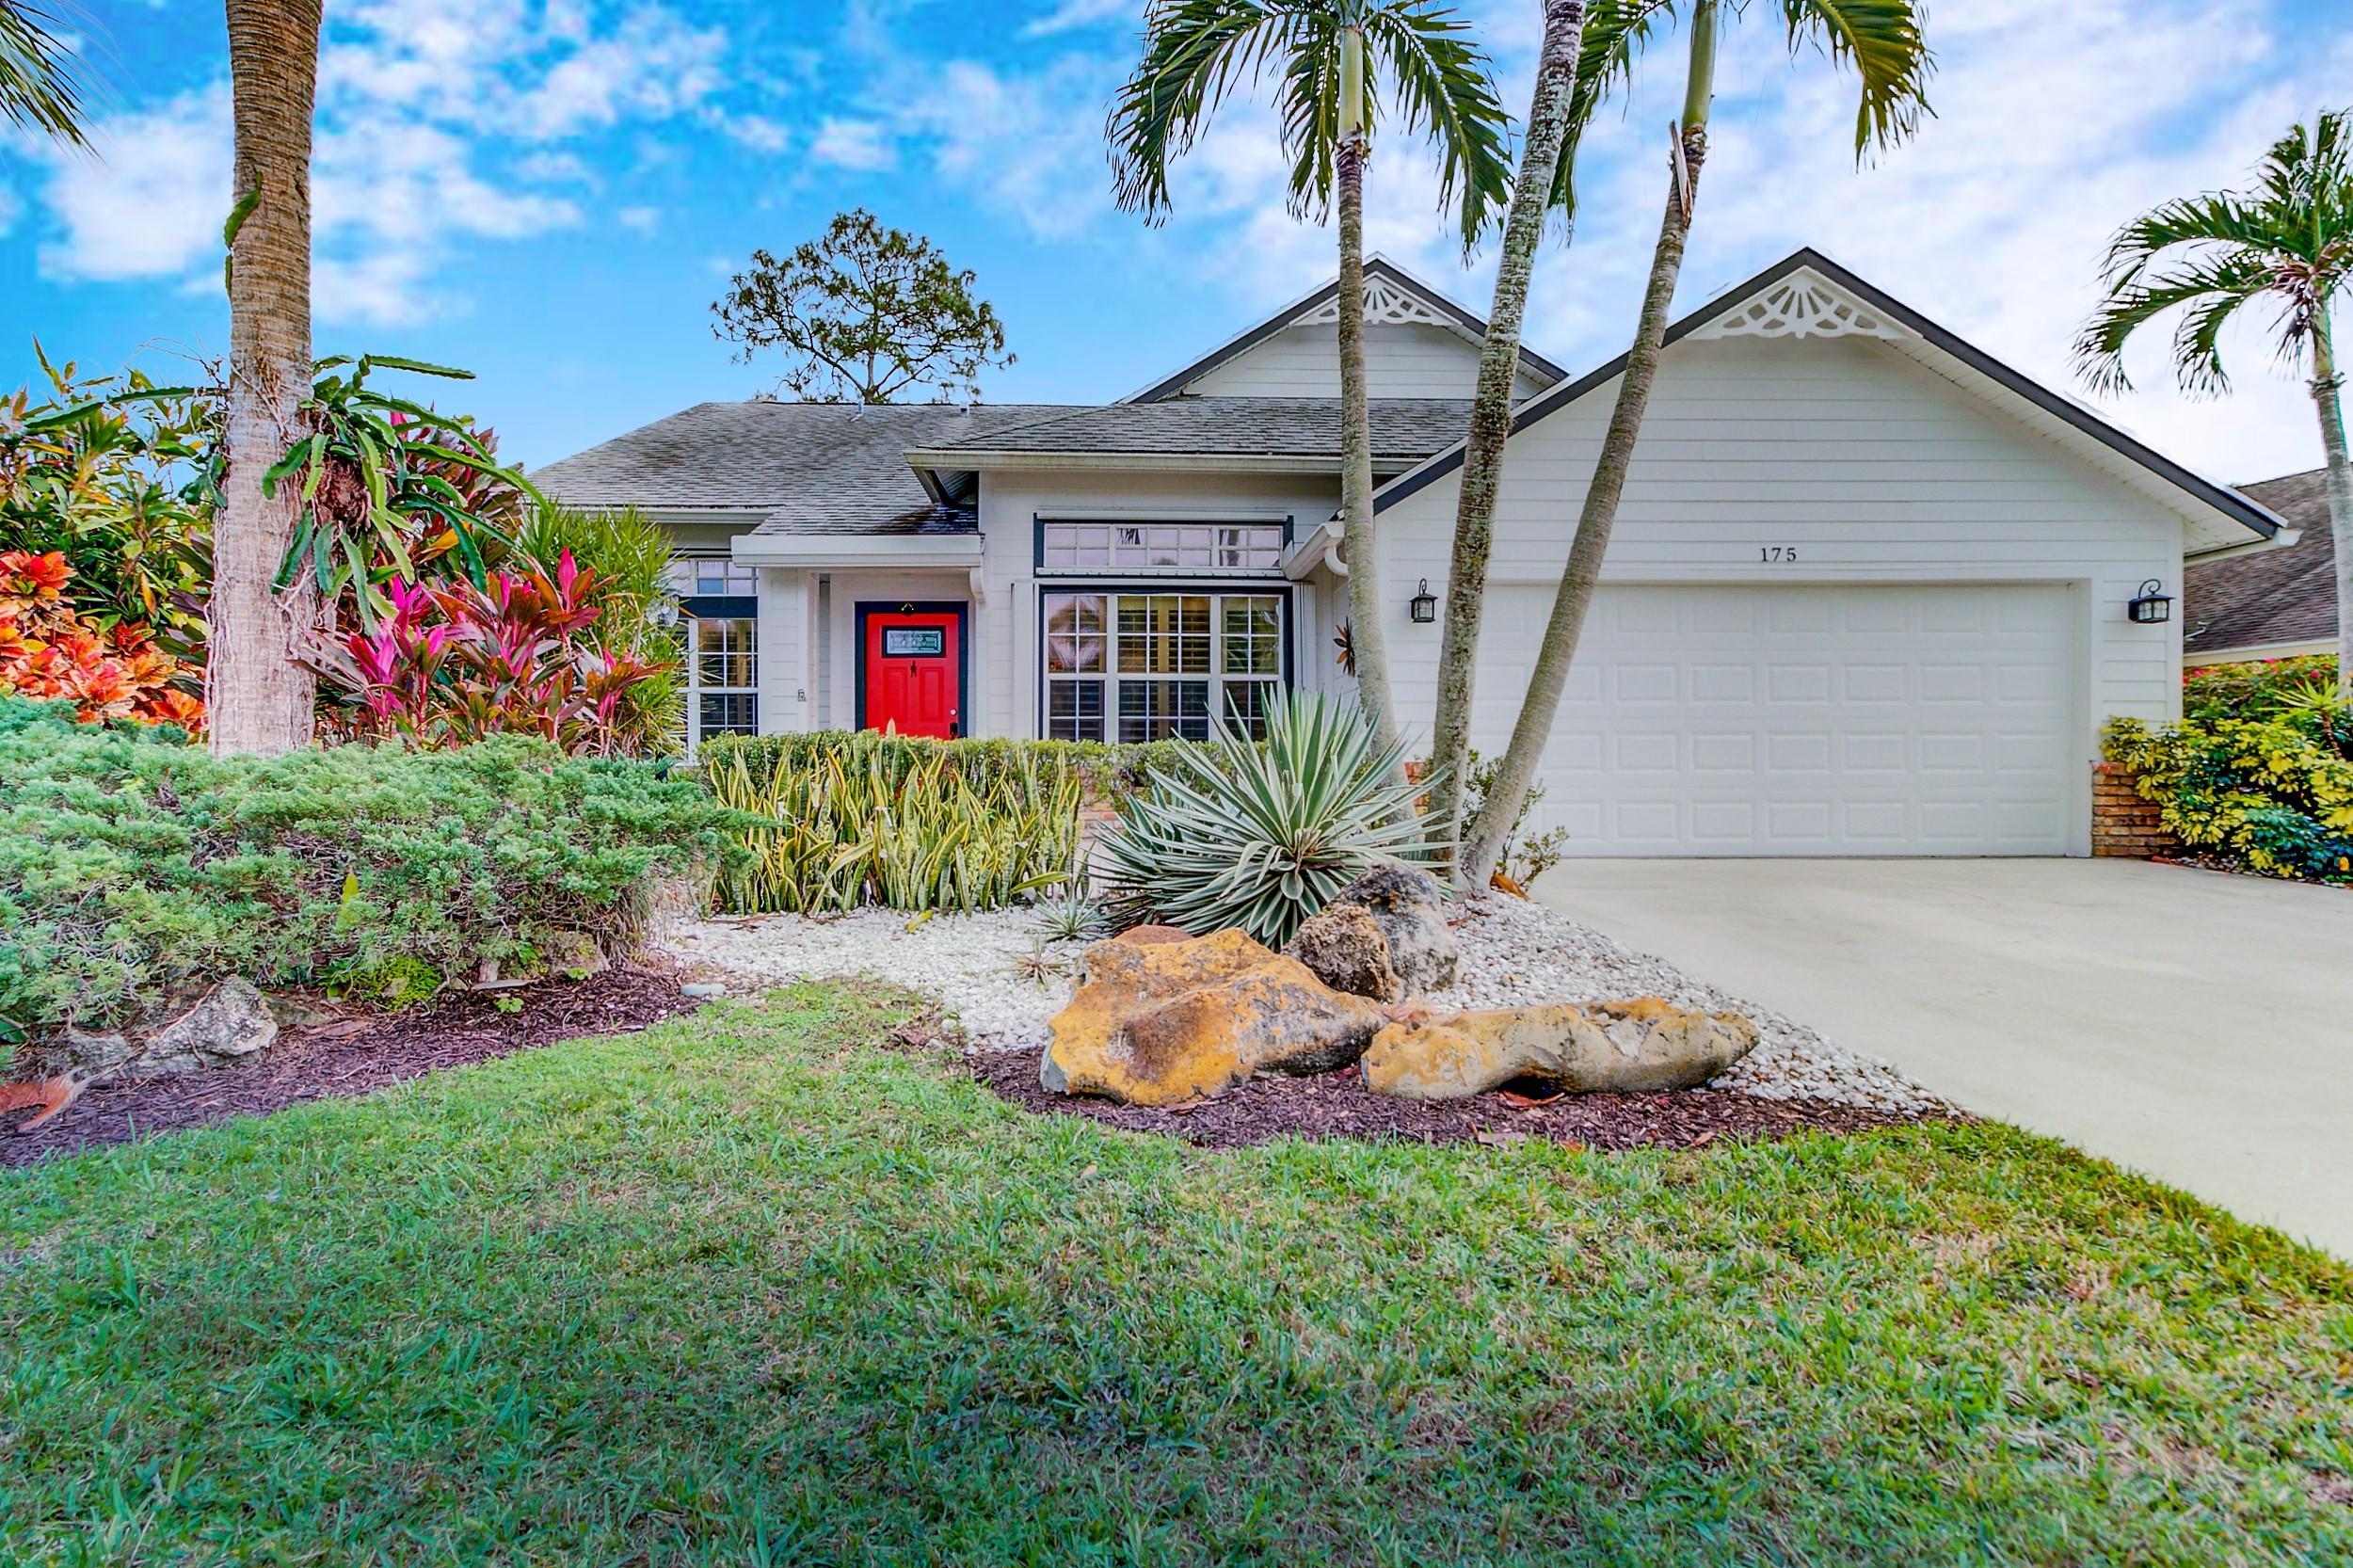 175 Kings Way - Royal Palm Beach, Florida